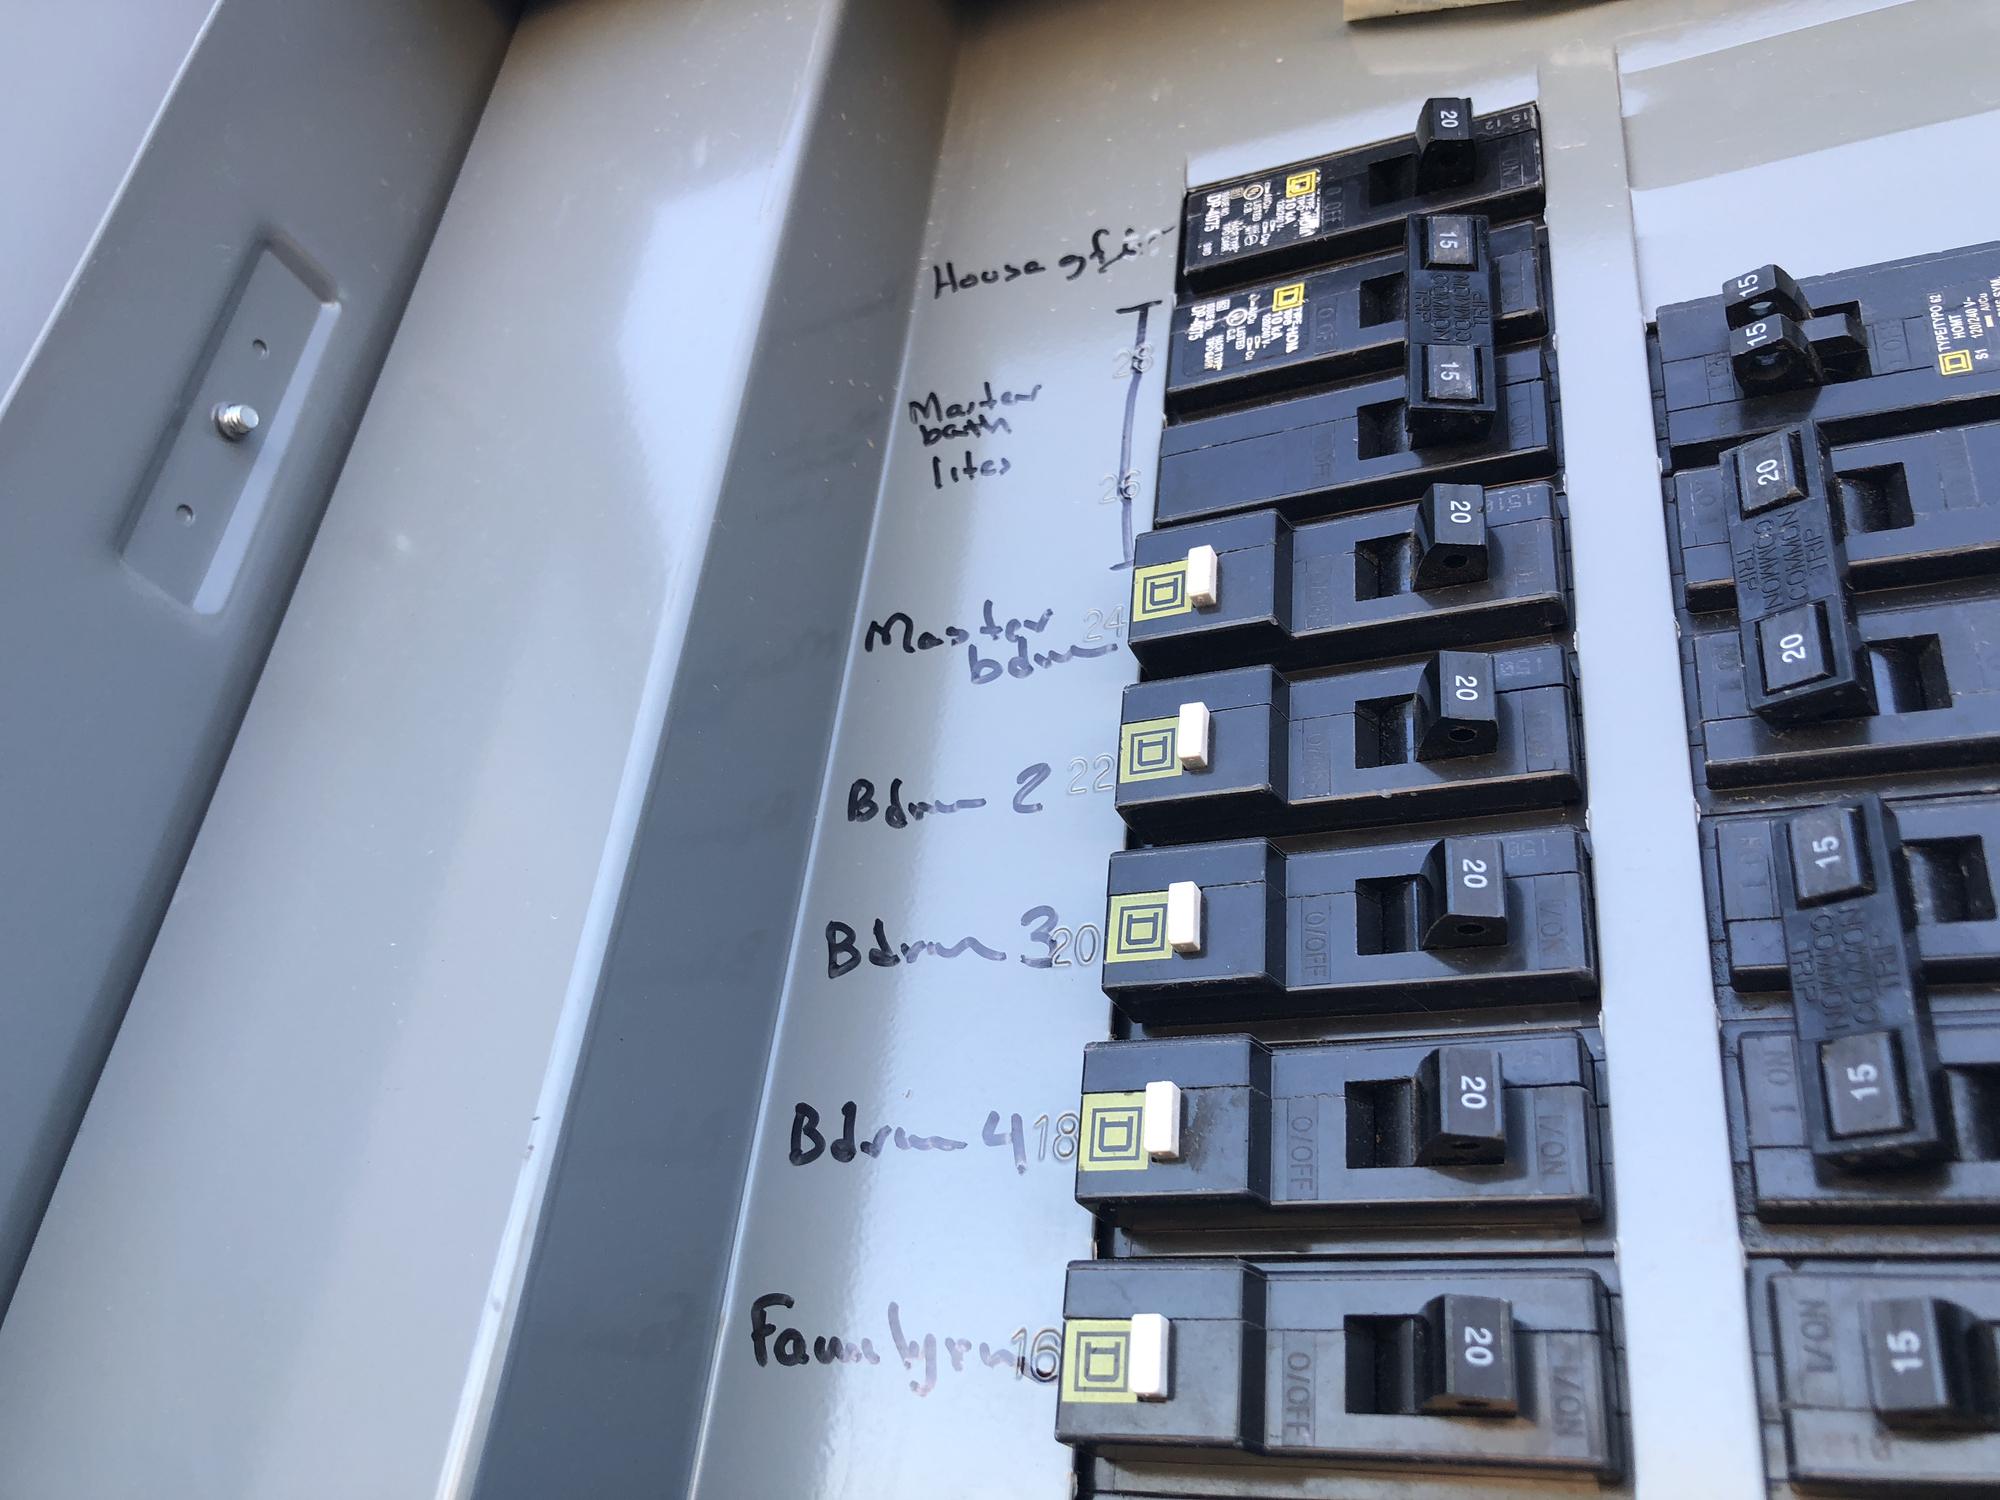 Circuit breakers look something like this (Above)